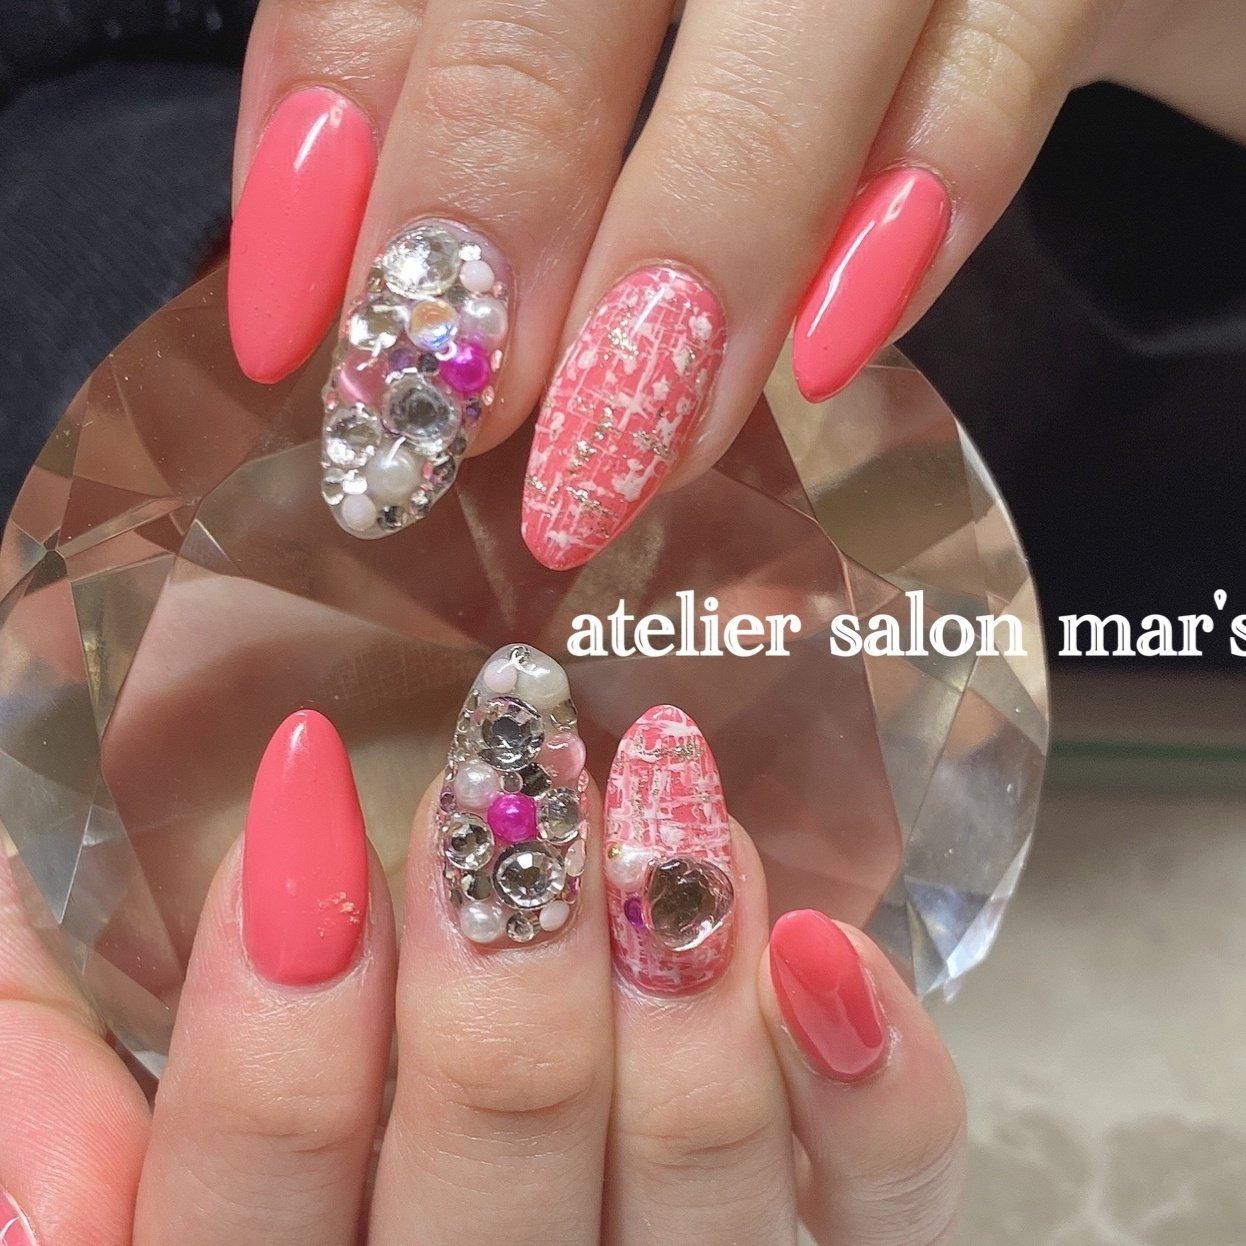 #spring #ピンク #女子力 #可愛い❤️ #ワンカラー #ビジュー #ハート #ツイード #デコ #ピンク #シルバー #masayo #ネイルブック